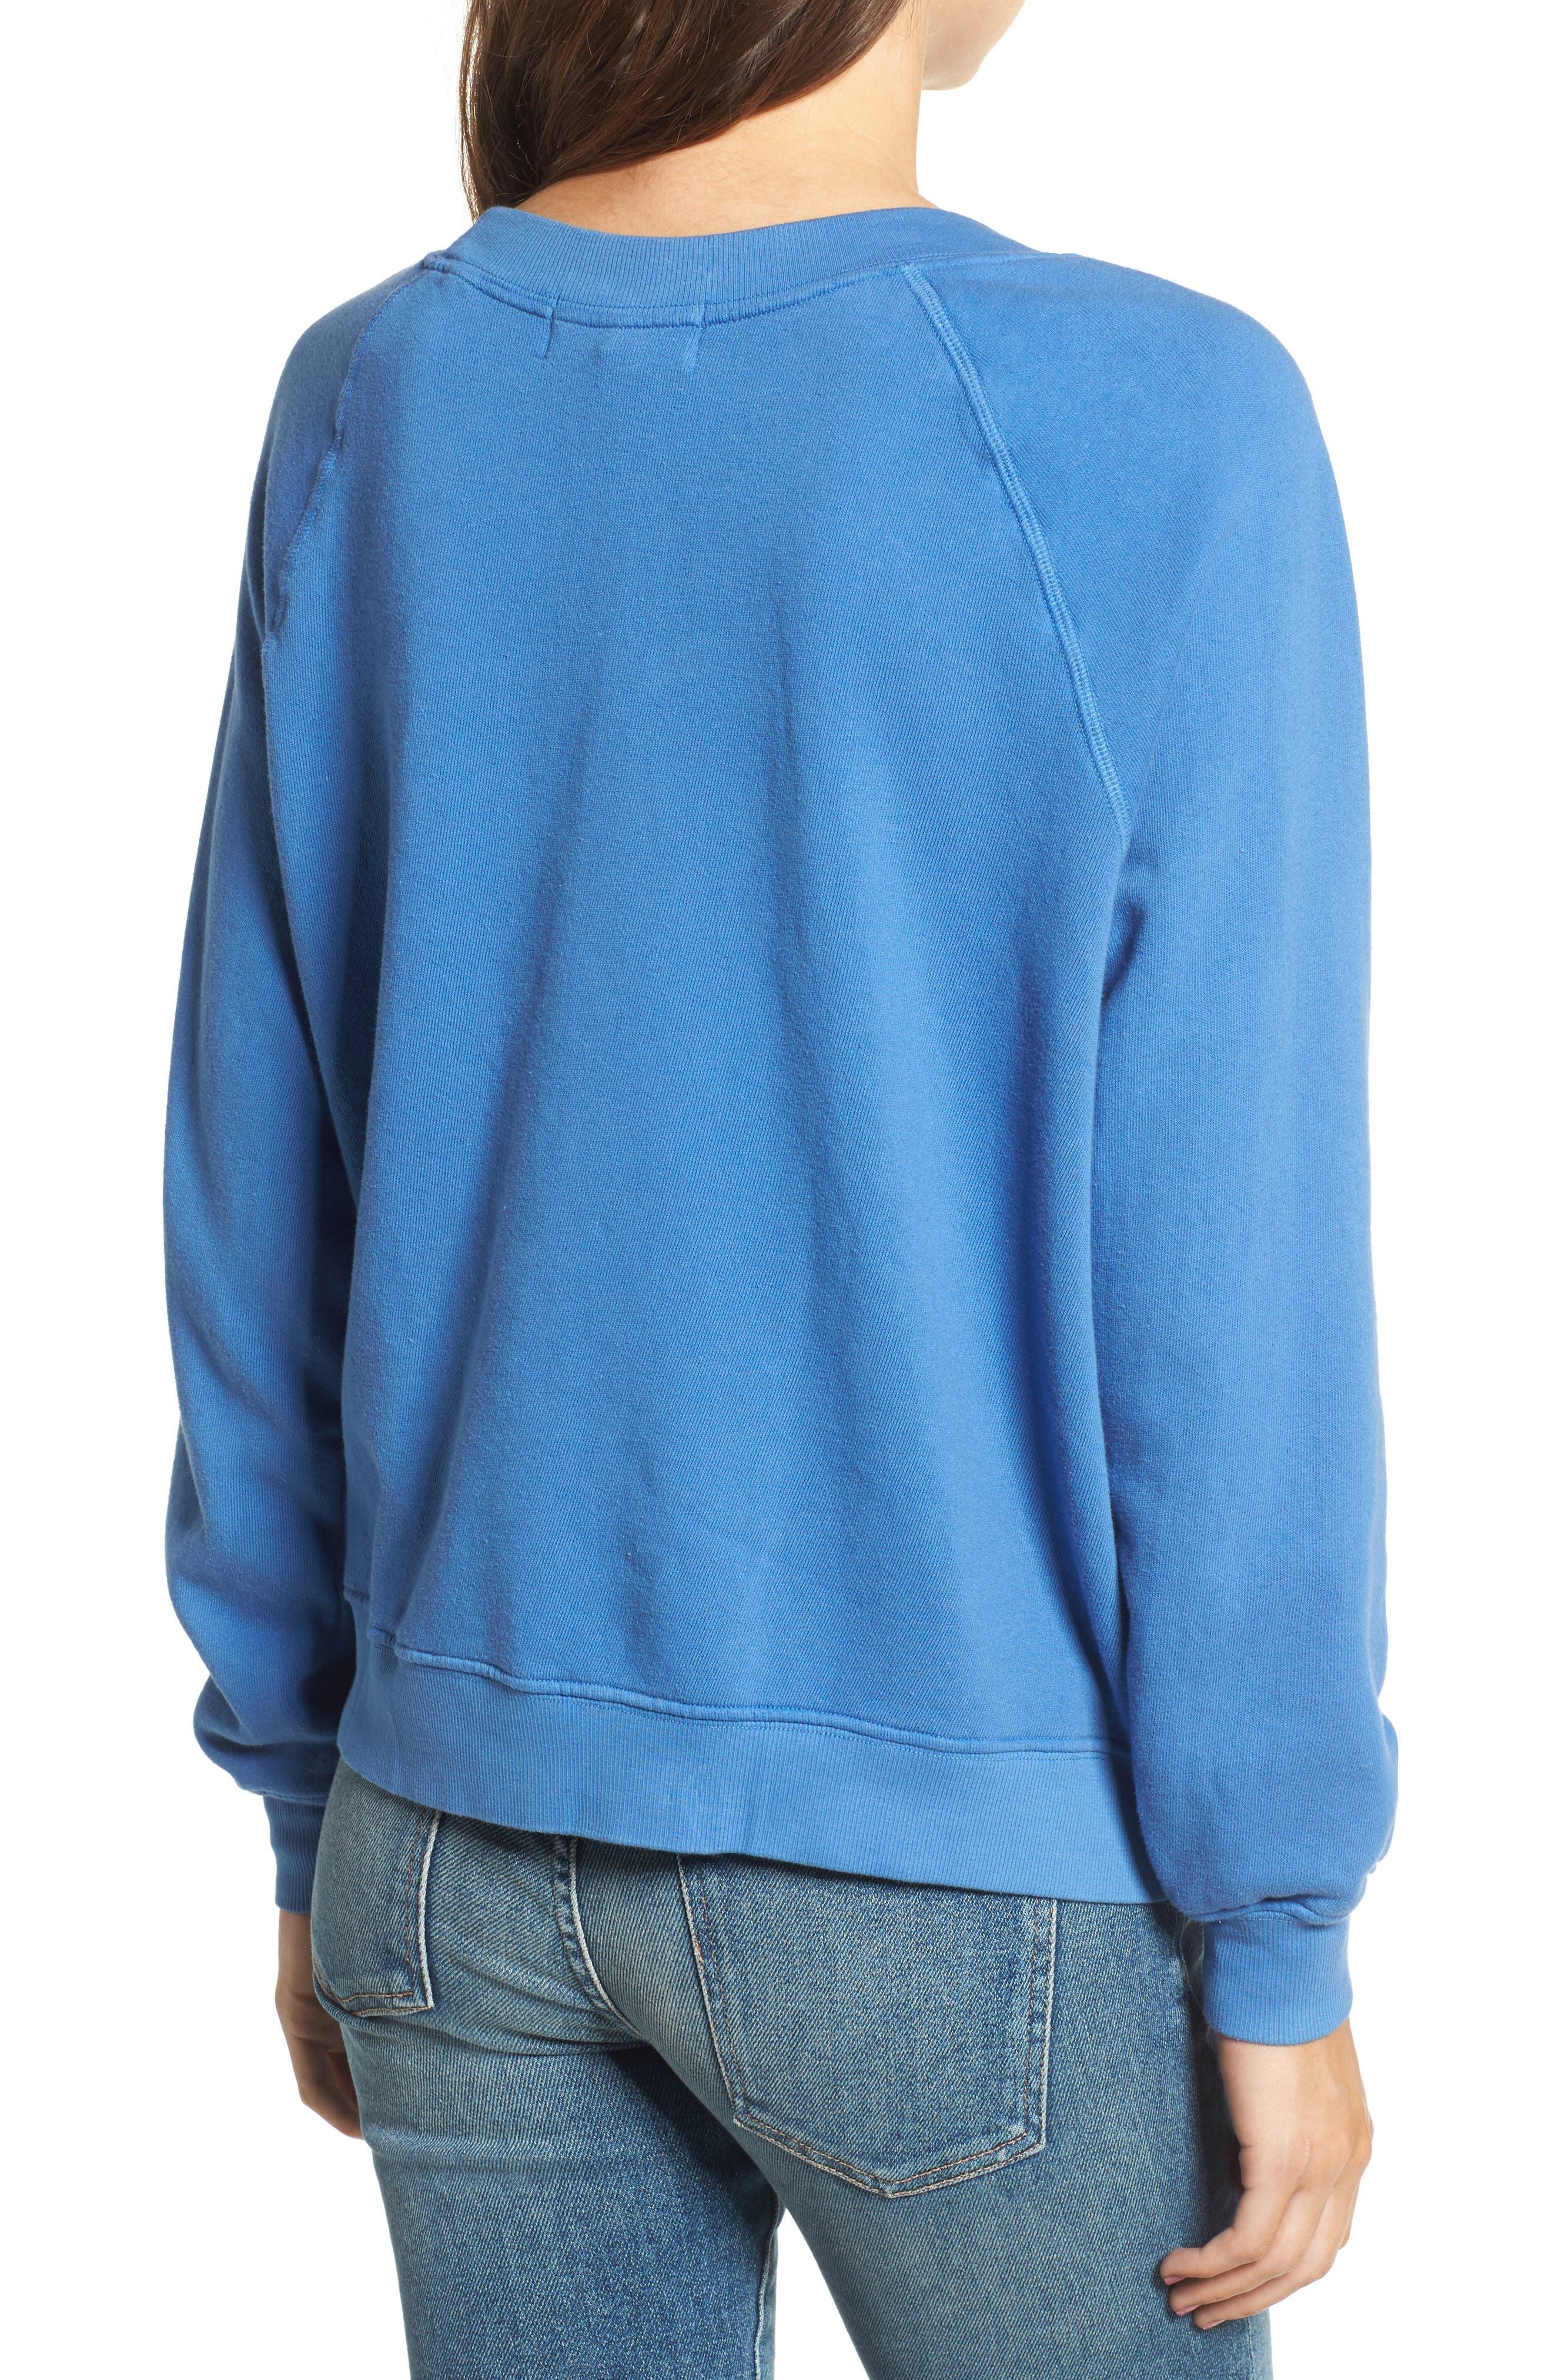 Naps & Snacks Sweatshirt,                             Alternate thumbnail 2, color,                             400